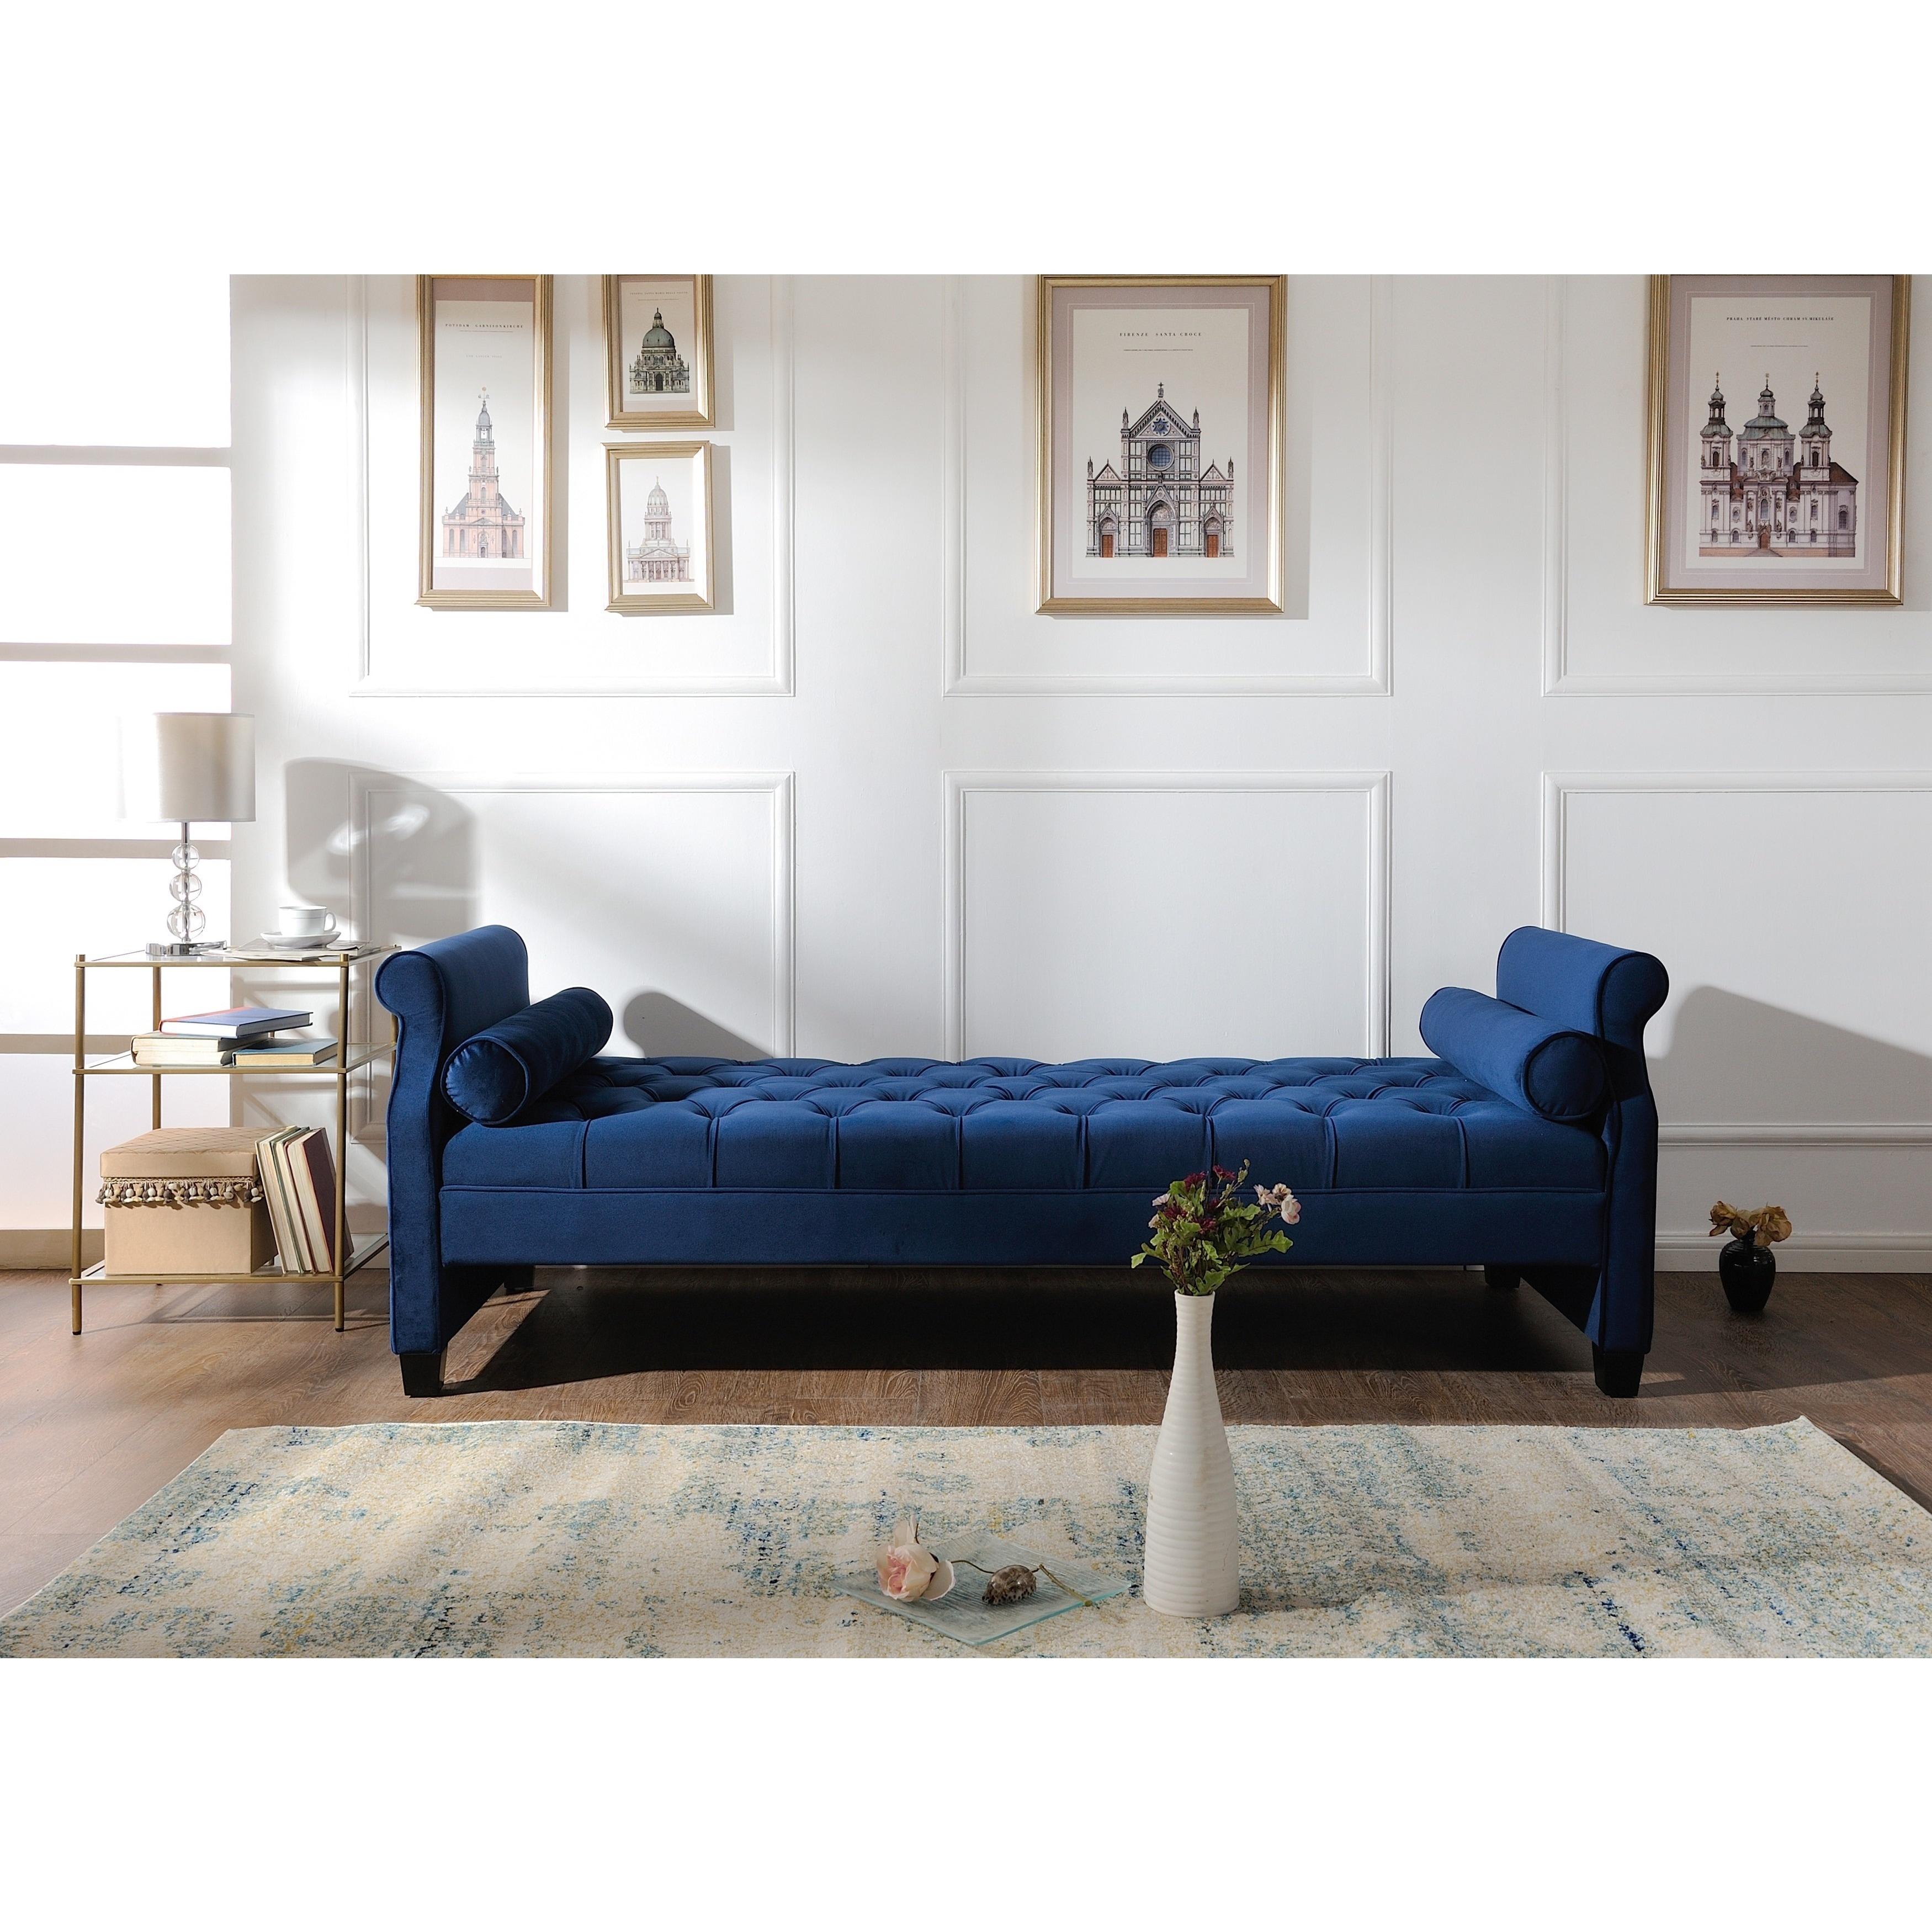 shop jennifer taylor eliza tufted upholstered sofa bed free rh overstock com sofa sleeper overstock pull out sofa bed overstock